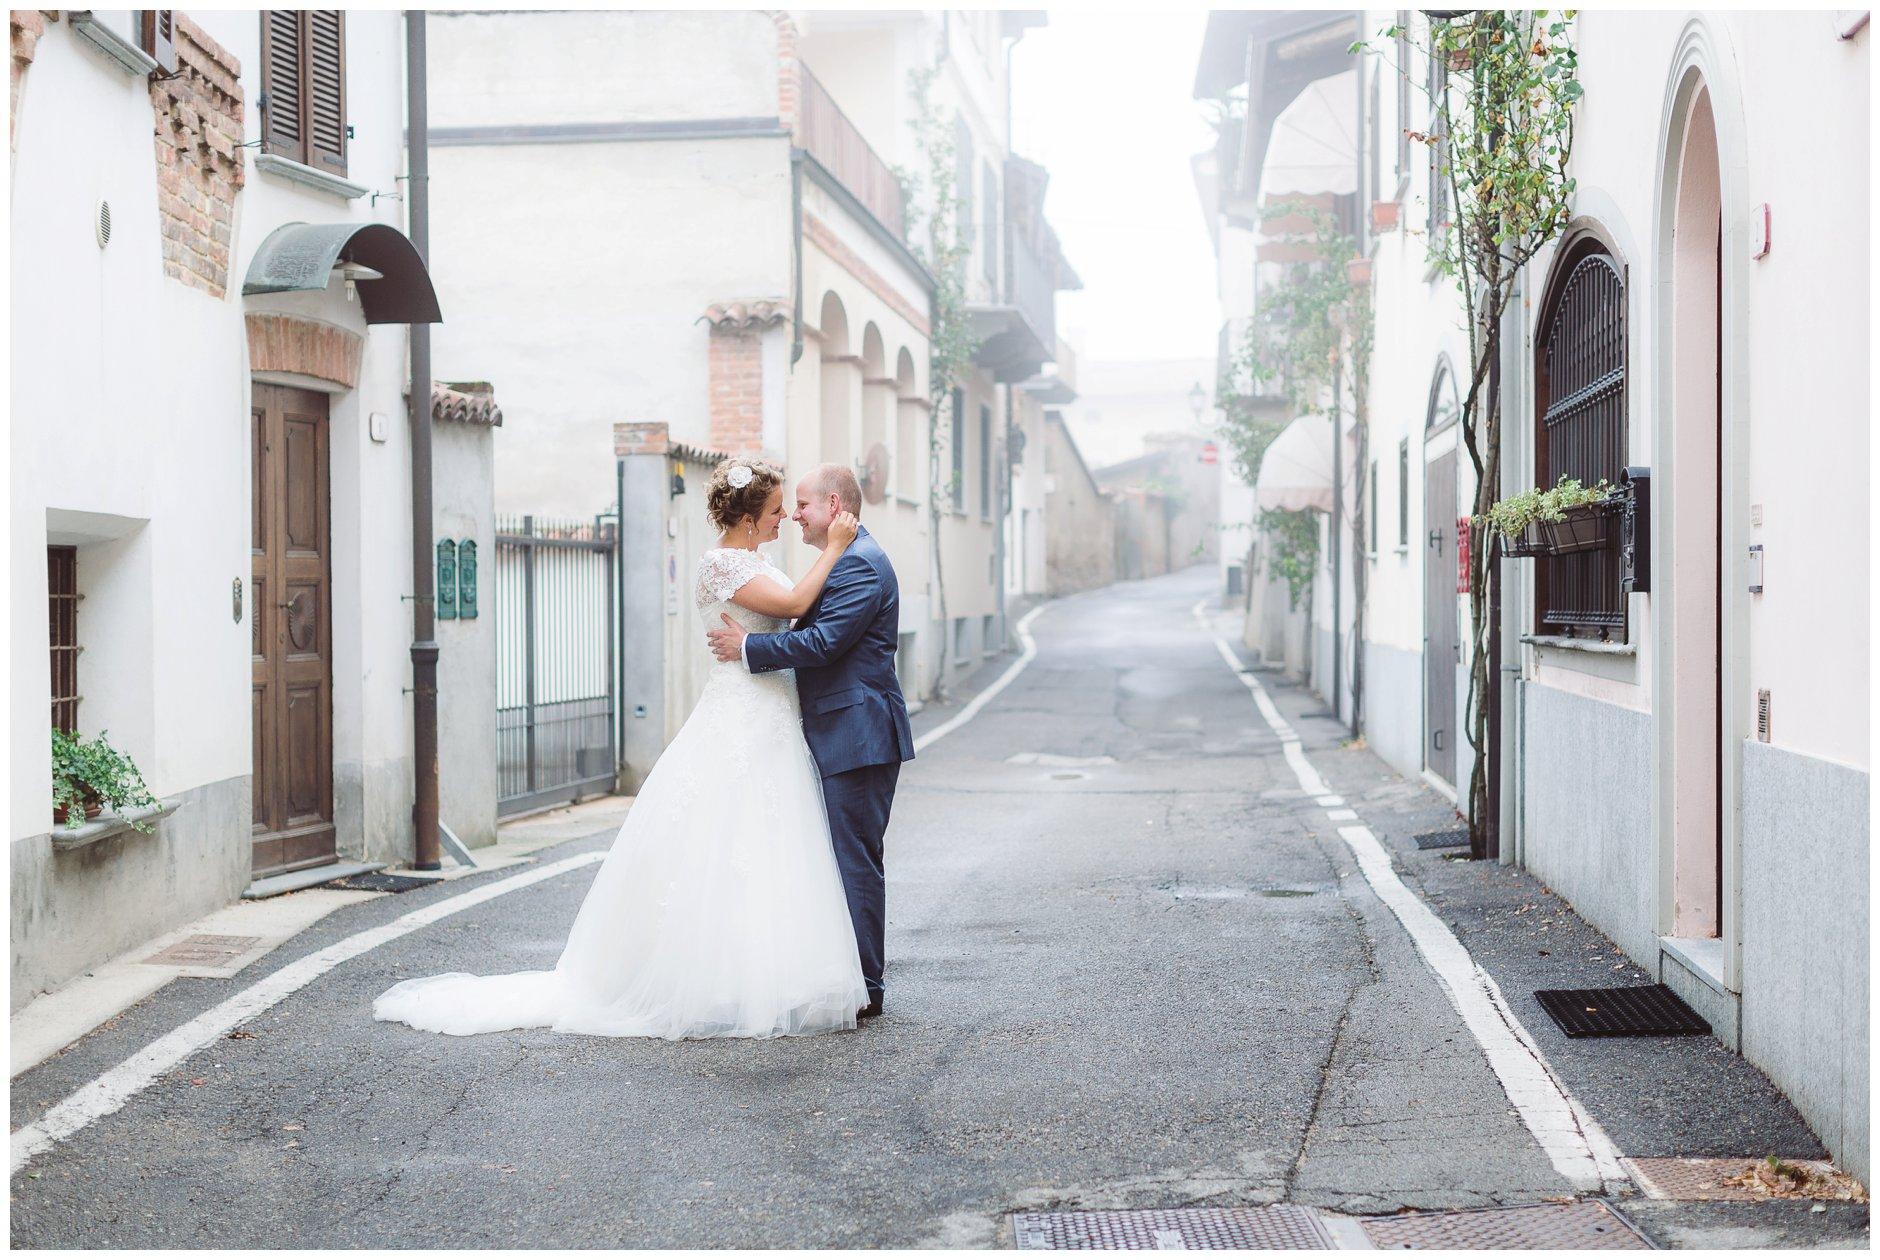 bryllup i Italia La Morras gater tåkelagt